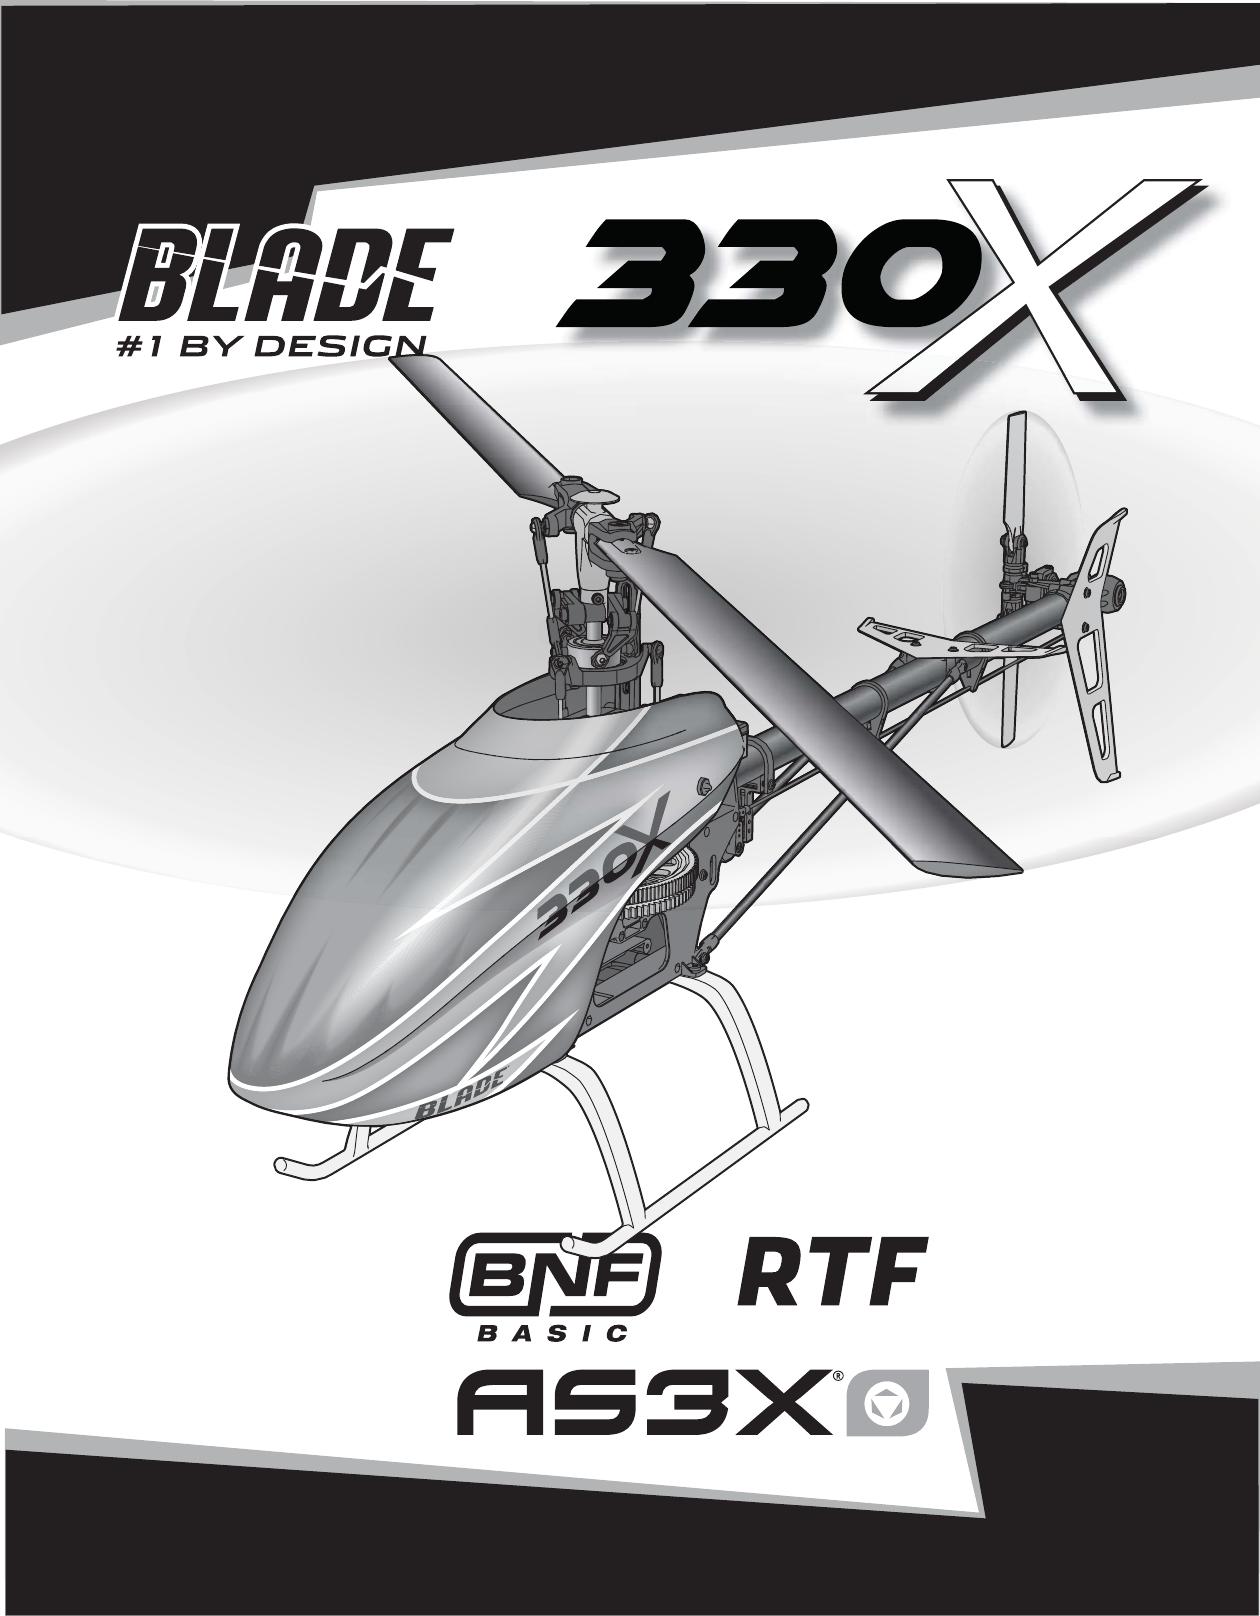 Blade 330X manual